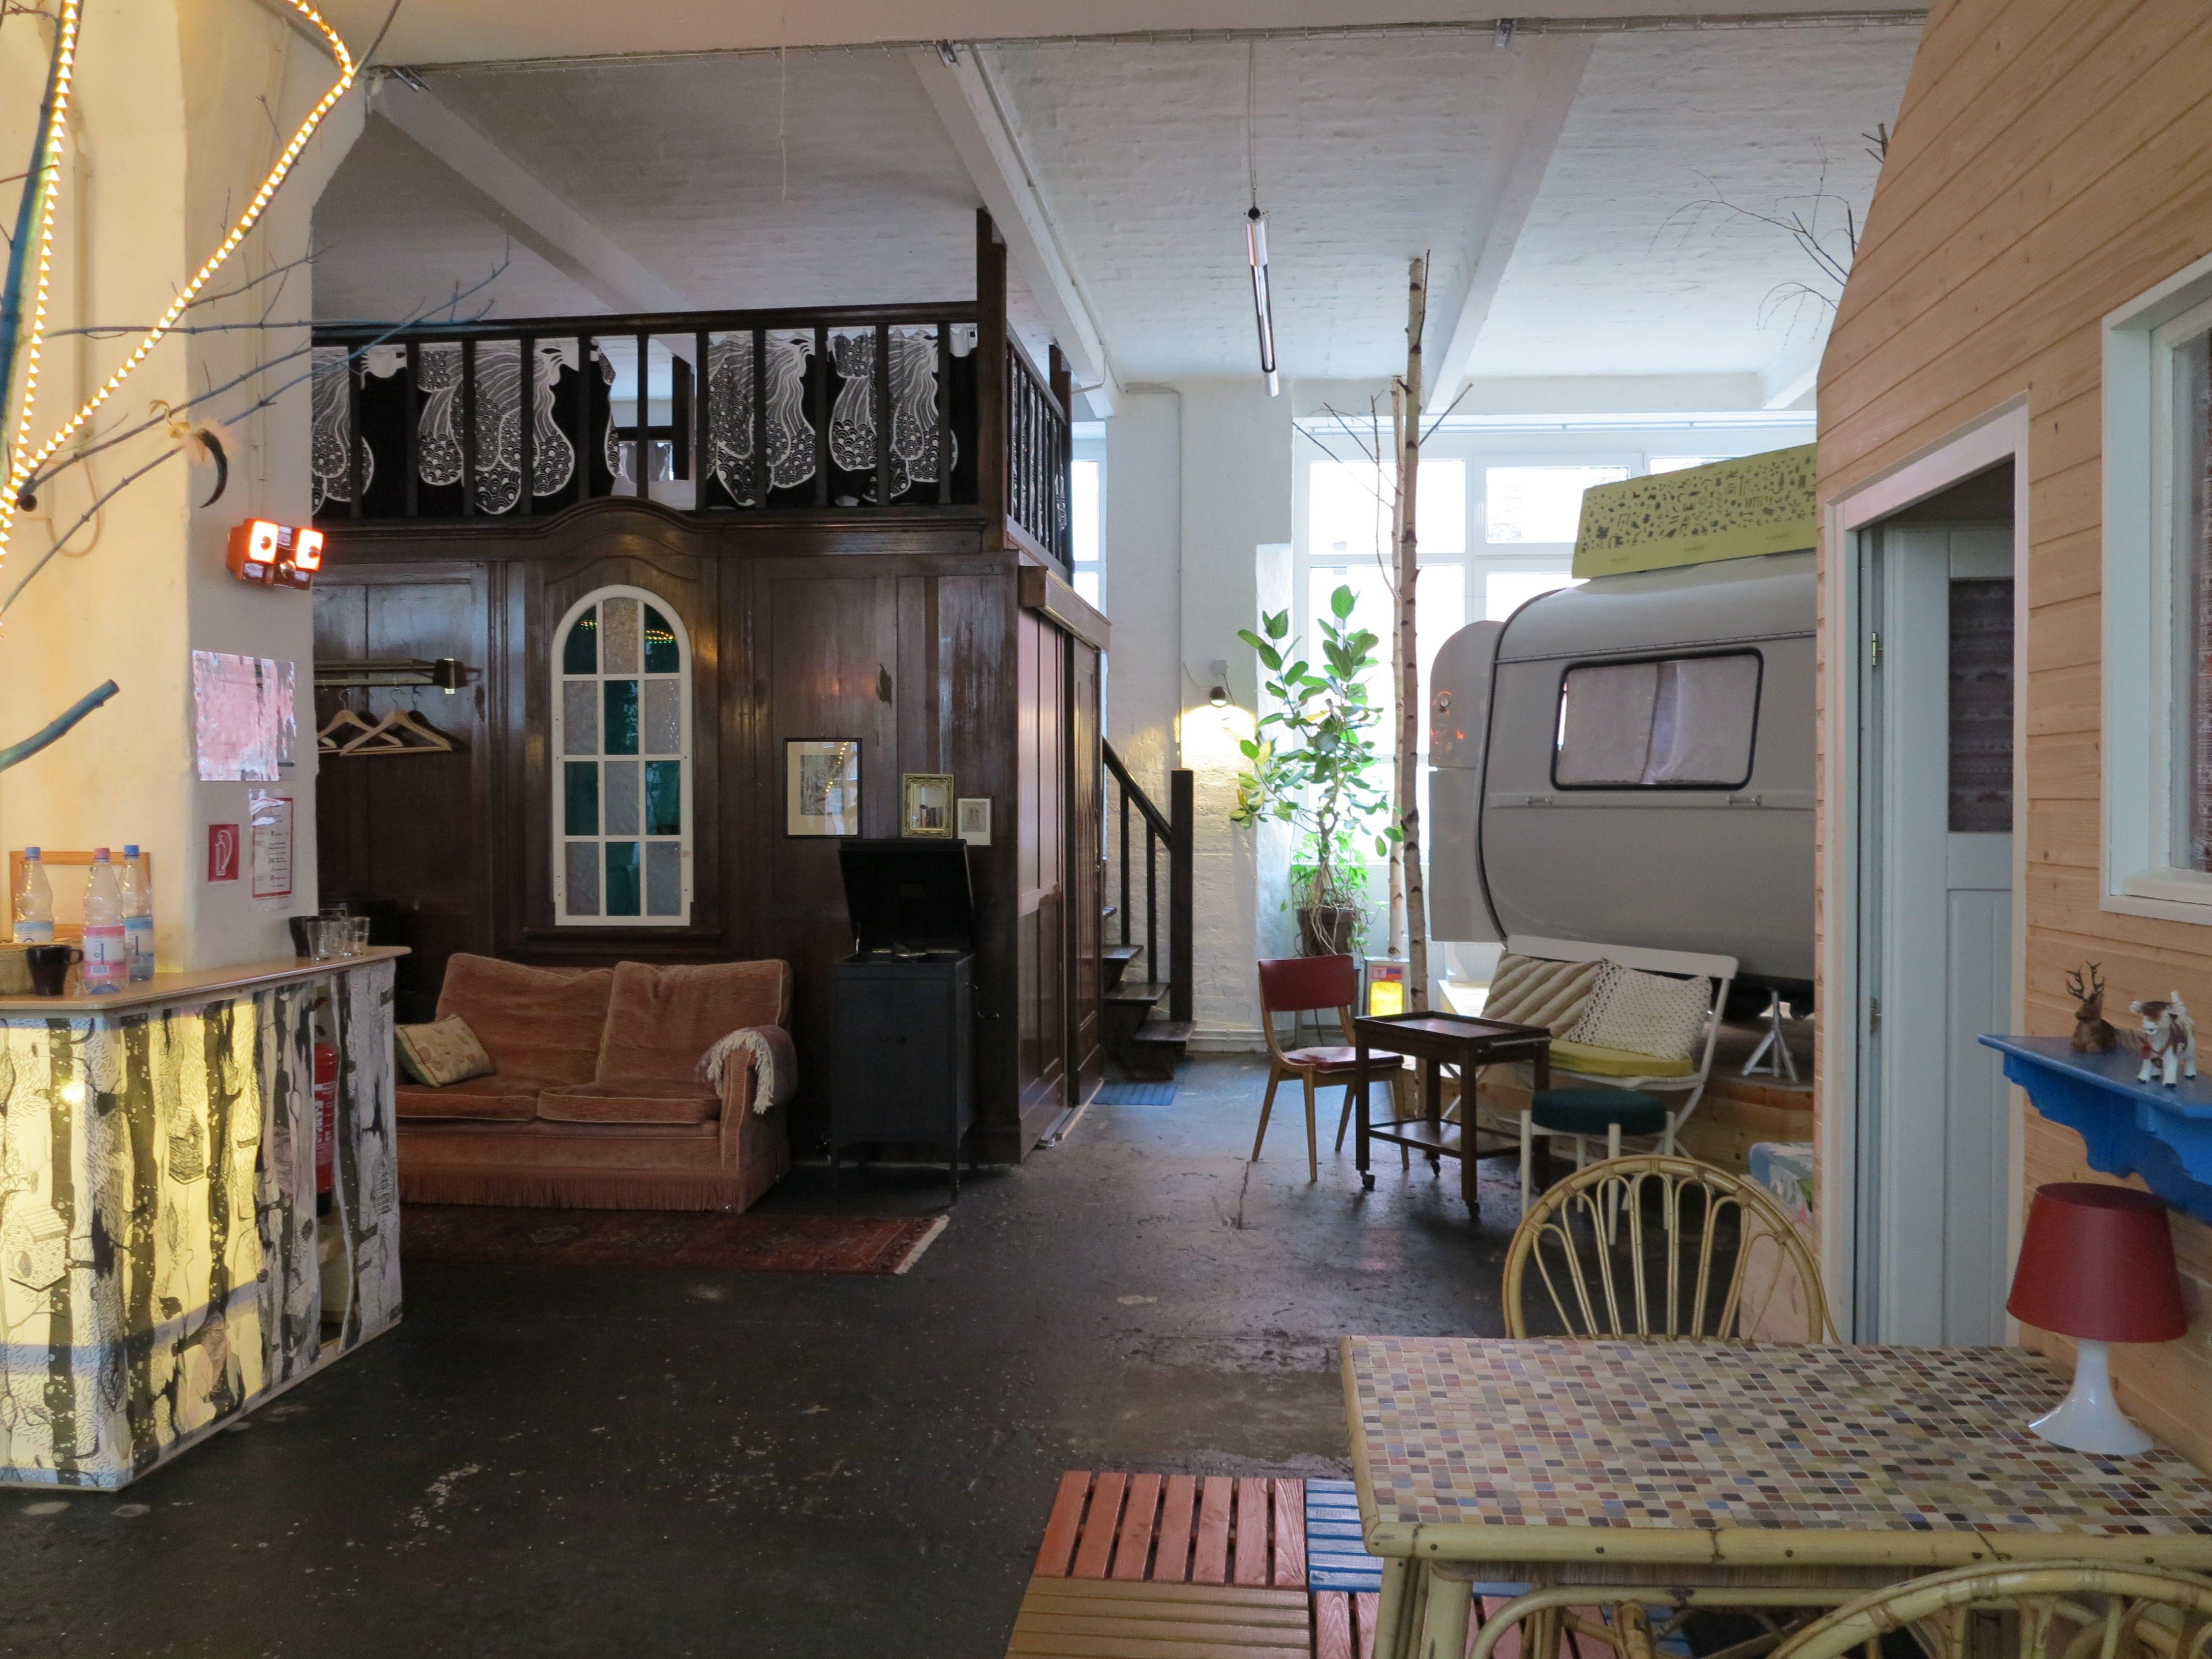 huettenpalast berlin travel pinterest indoor camping. Black Bedroom Furniture Sets. Home Design Ideas